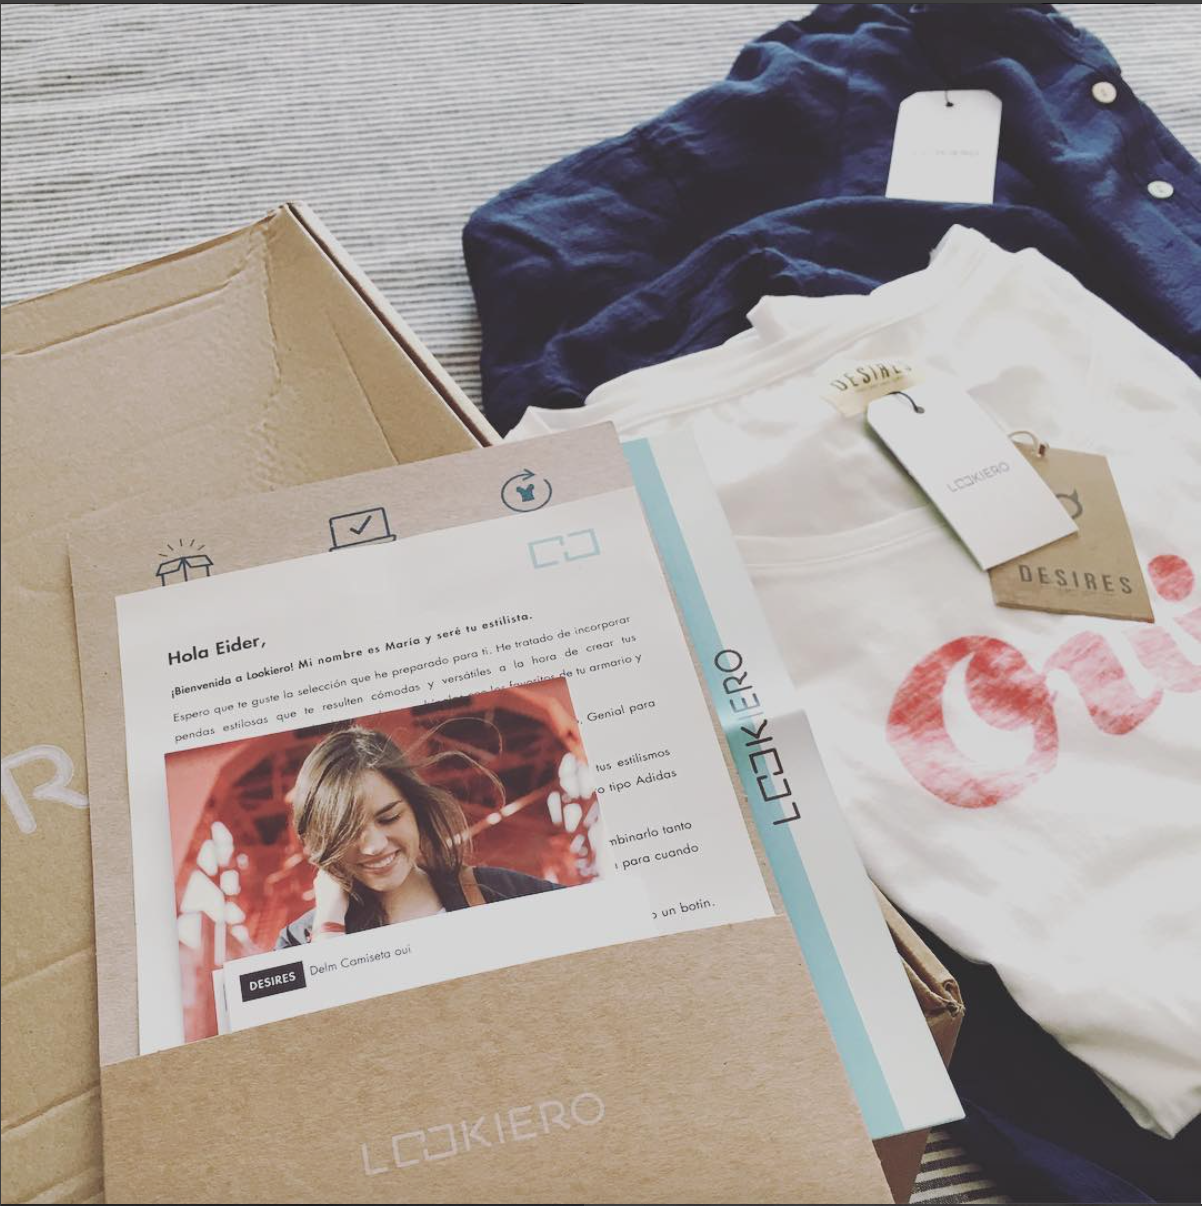 My first #lookiero experience 👍🏻 @lookiero #personalshopper  #fashion